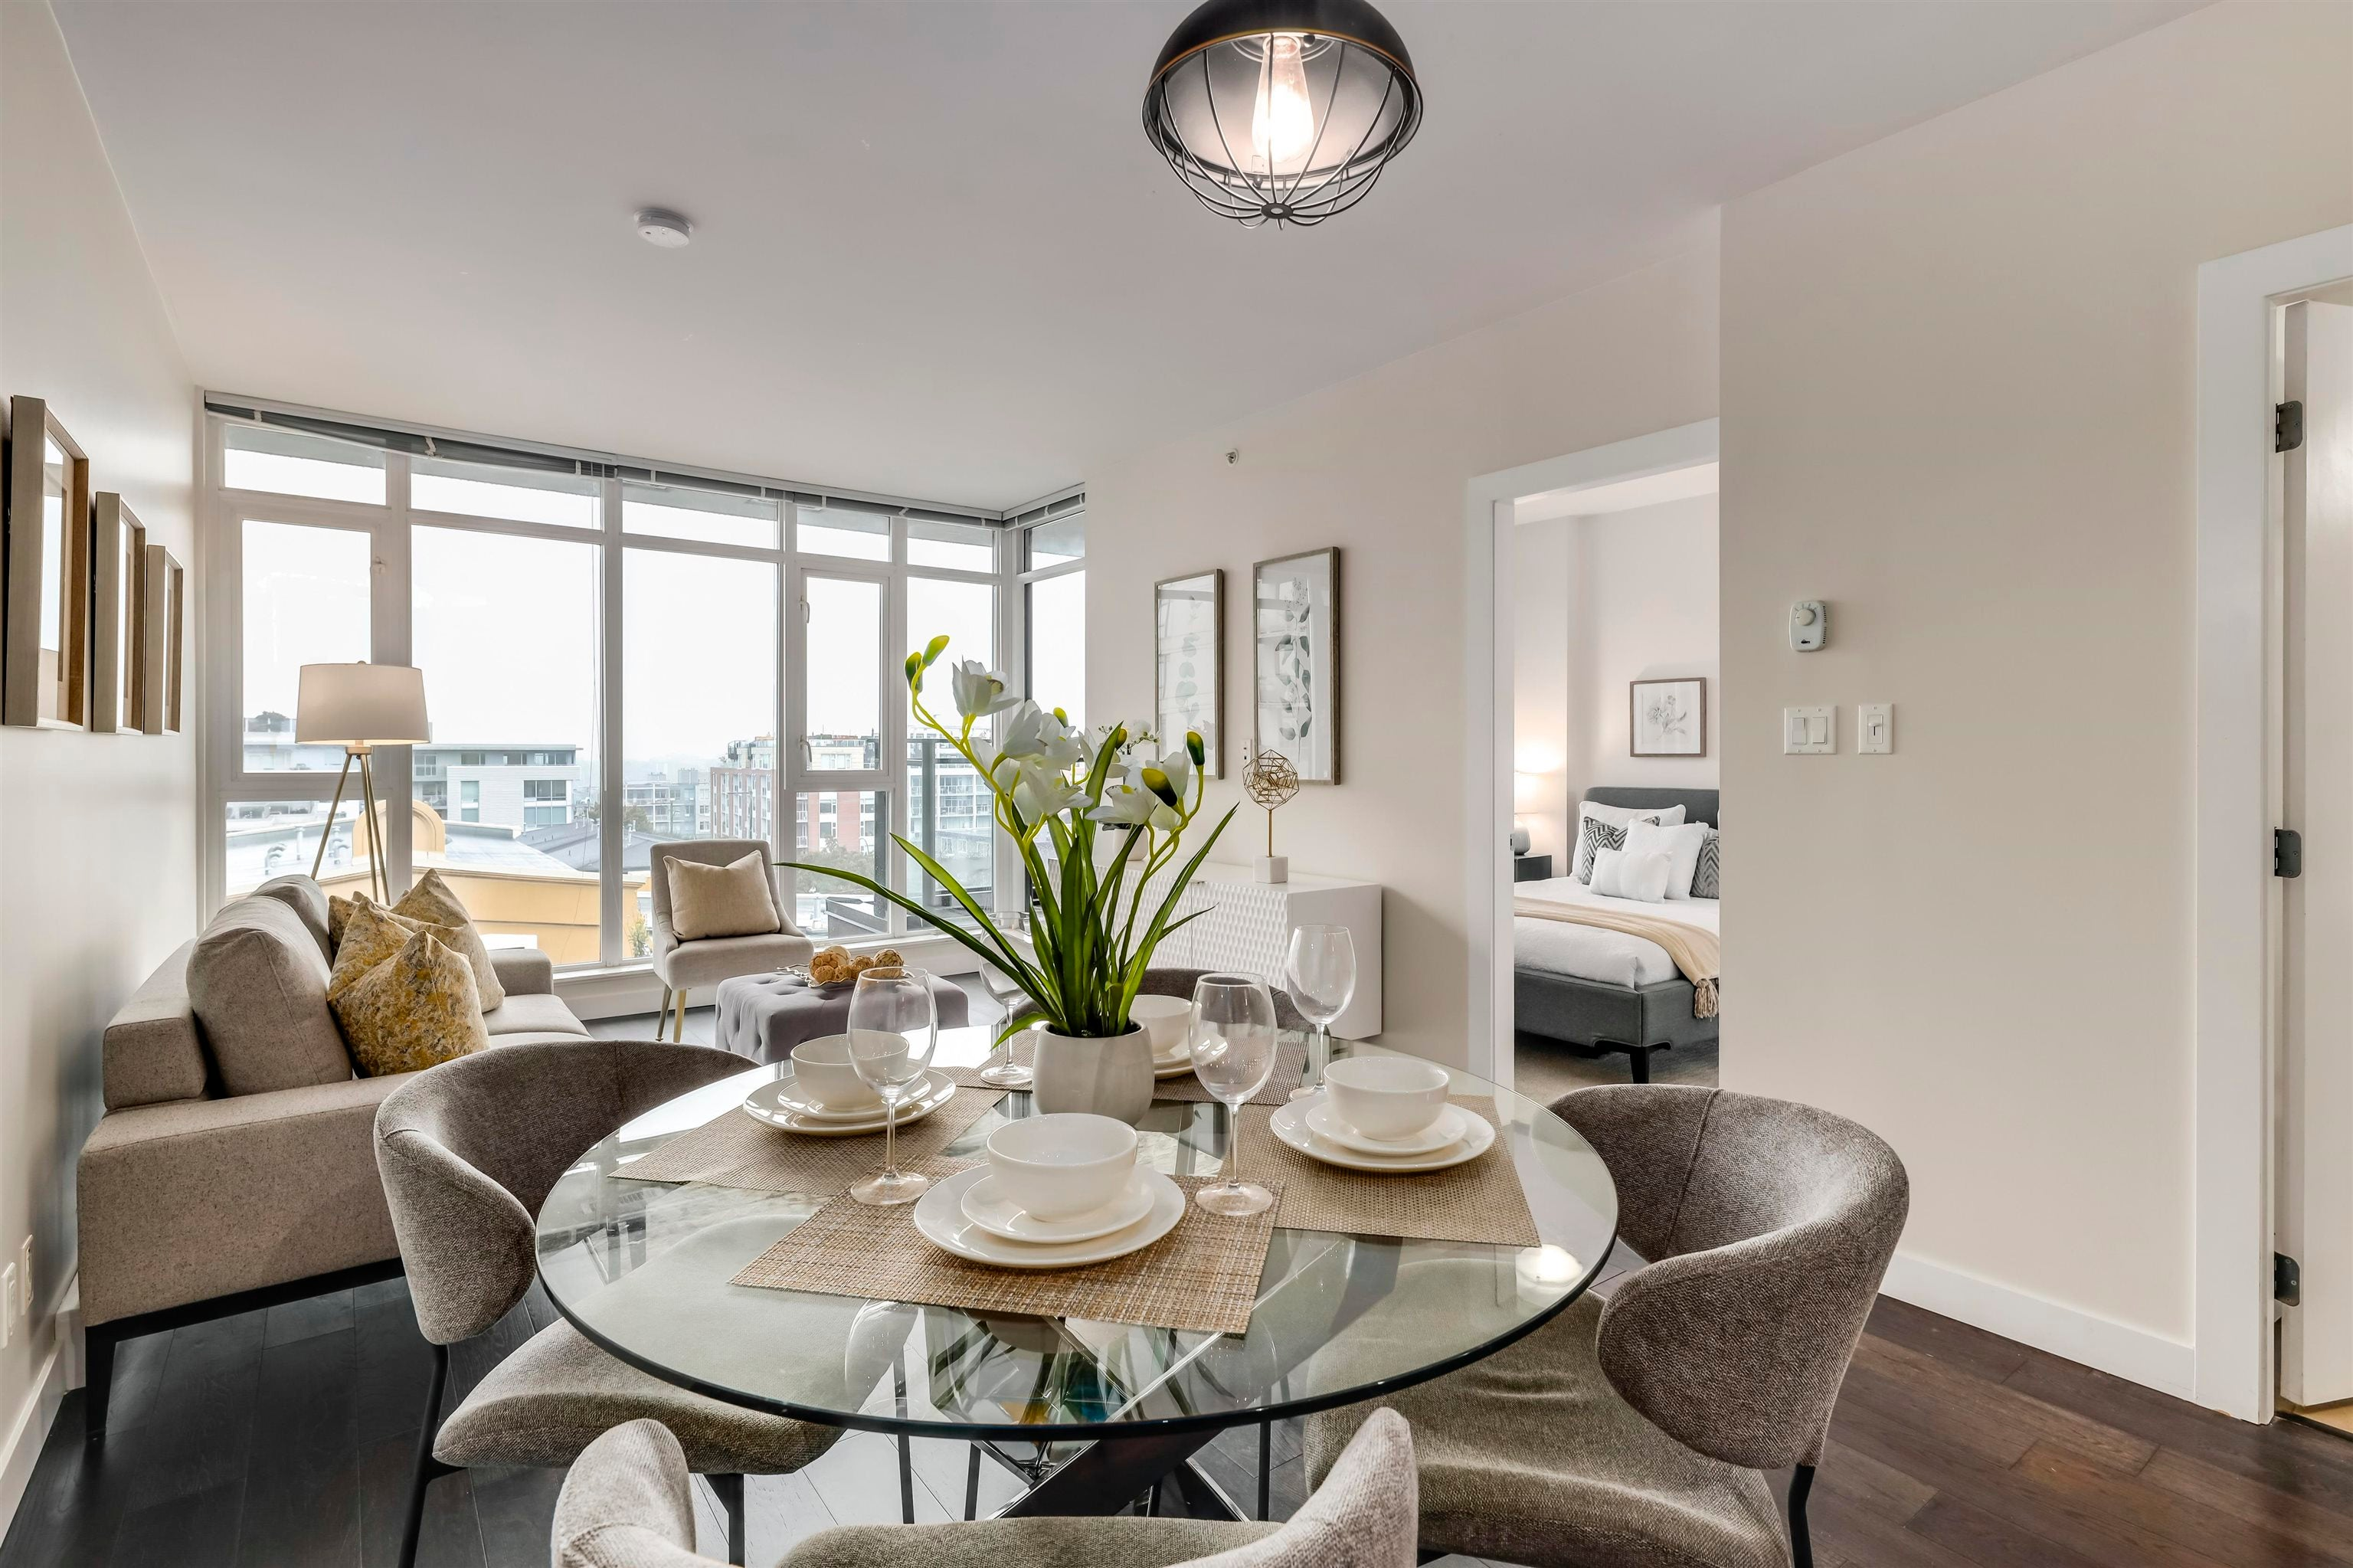 409 2321 SCOTIA STREET - Mount Pleasant VE Apartment/Condo for sale, 1 Bedroom (R2619350)